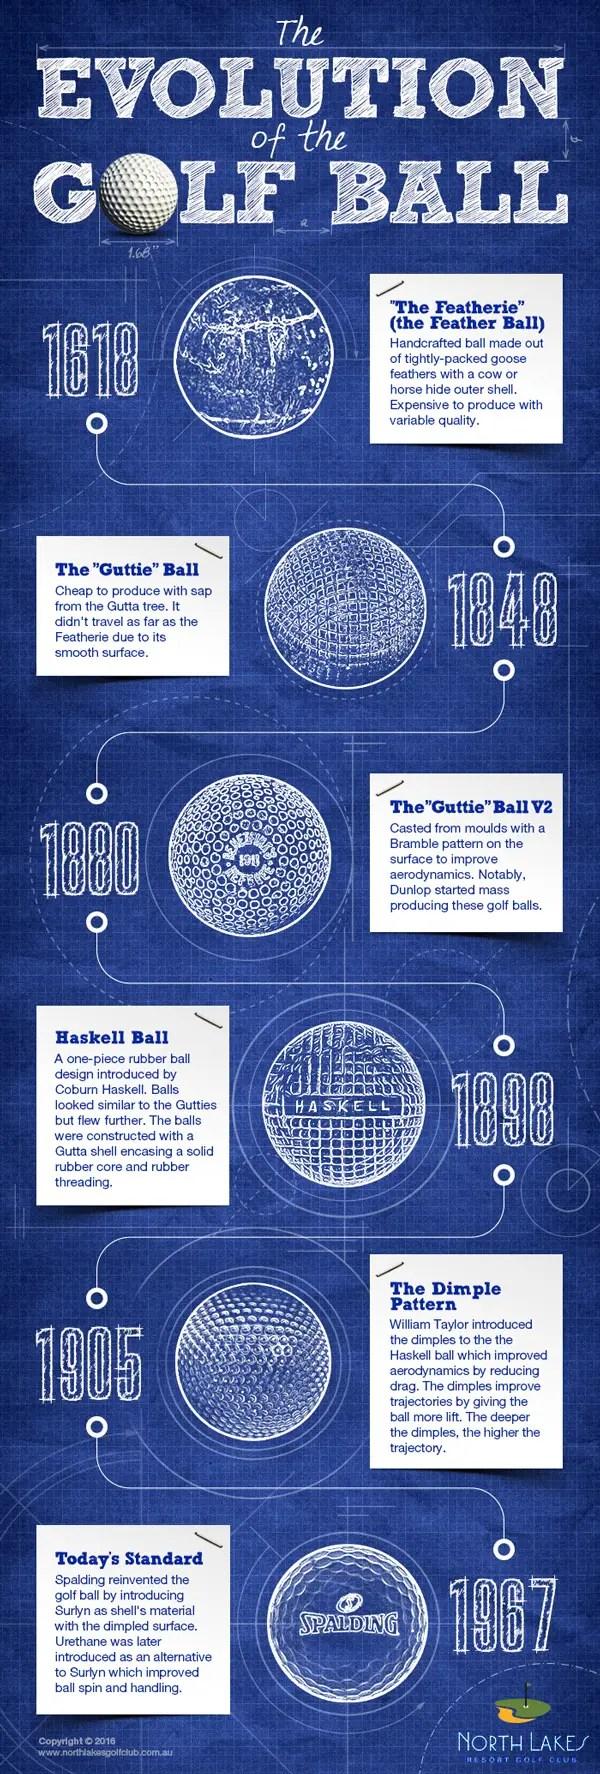 evolution of the golf ball